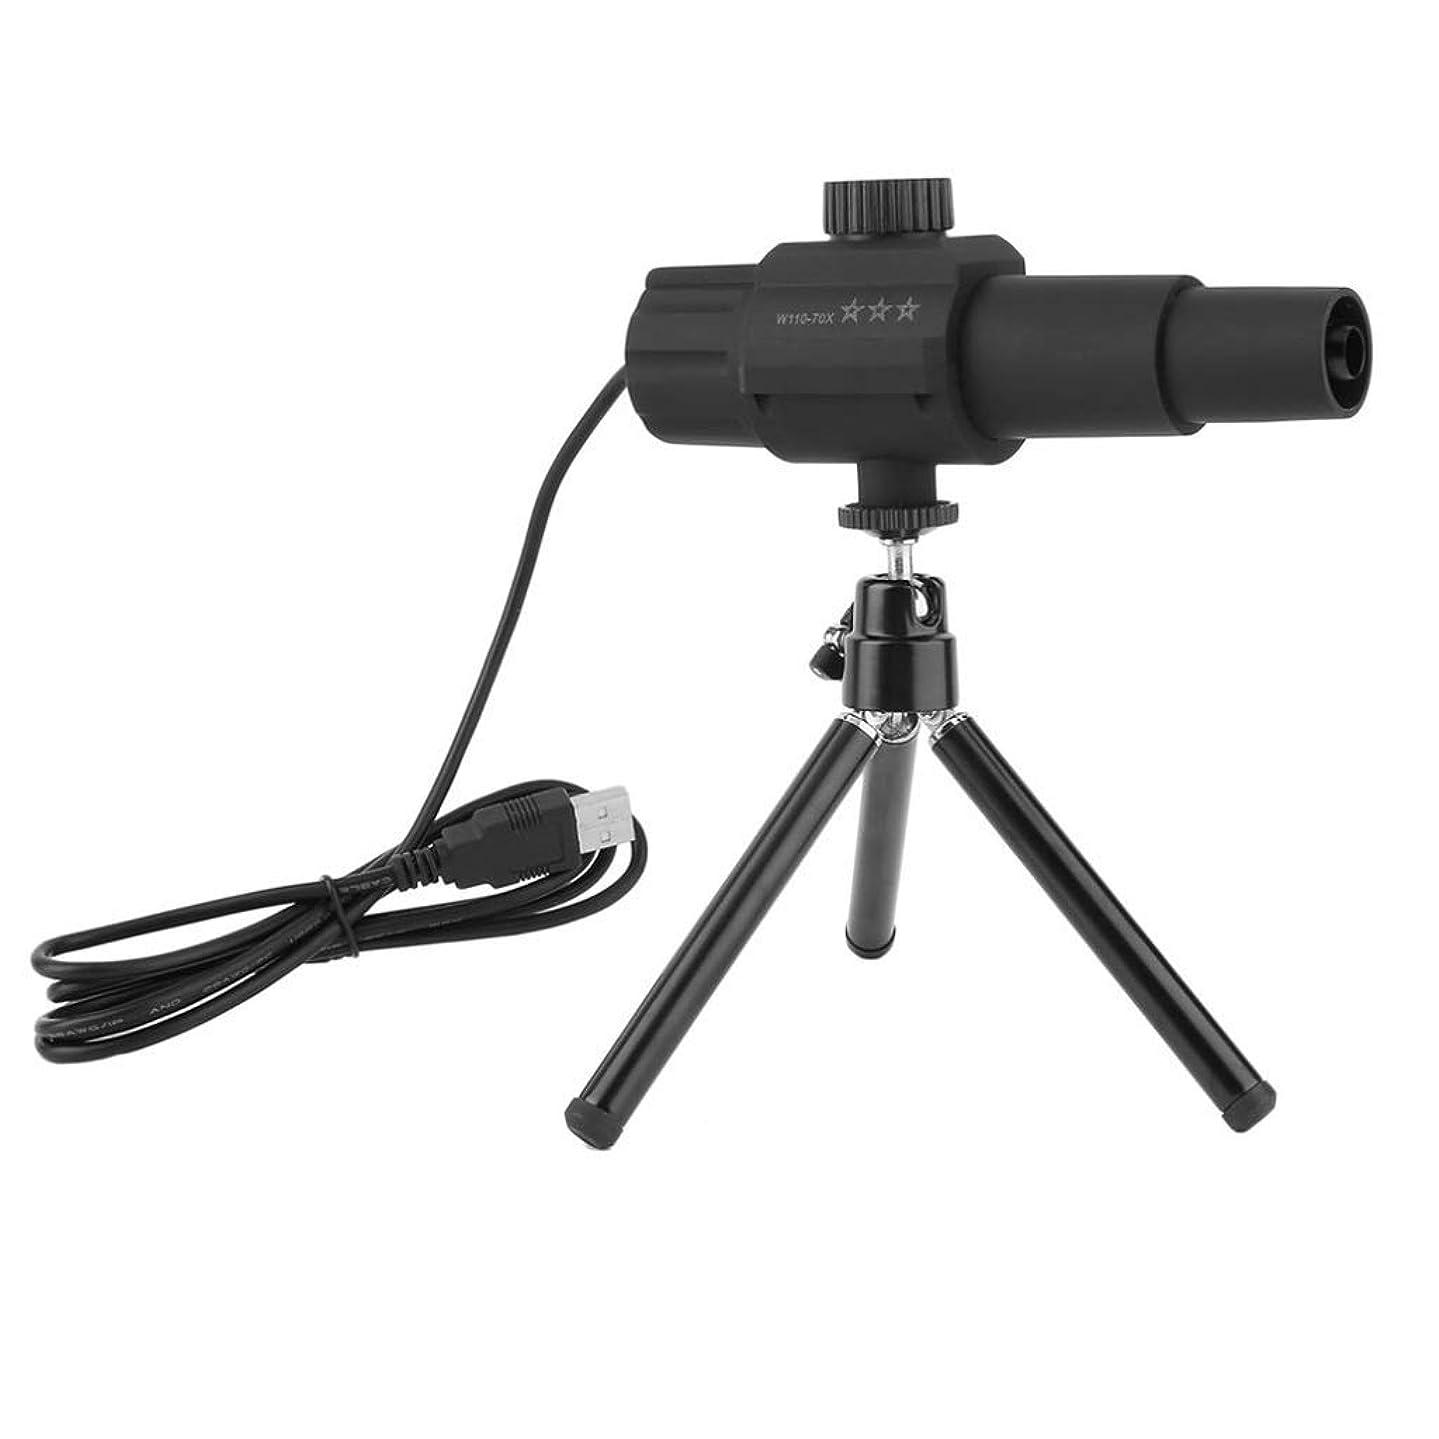 Jzmae New Smart Digital USB Telescope Monocular Adjustable Scalable Camera Zoom 70X HD 2.0MP Monitor for Recording Video